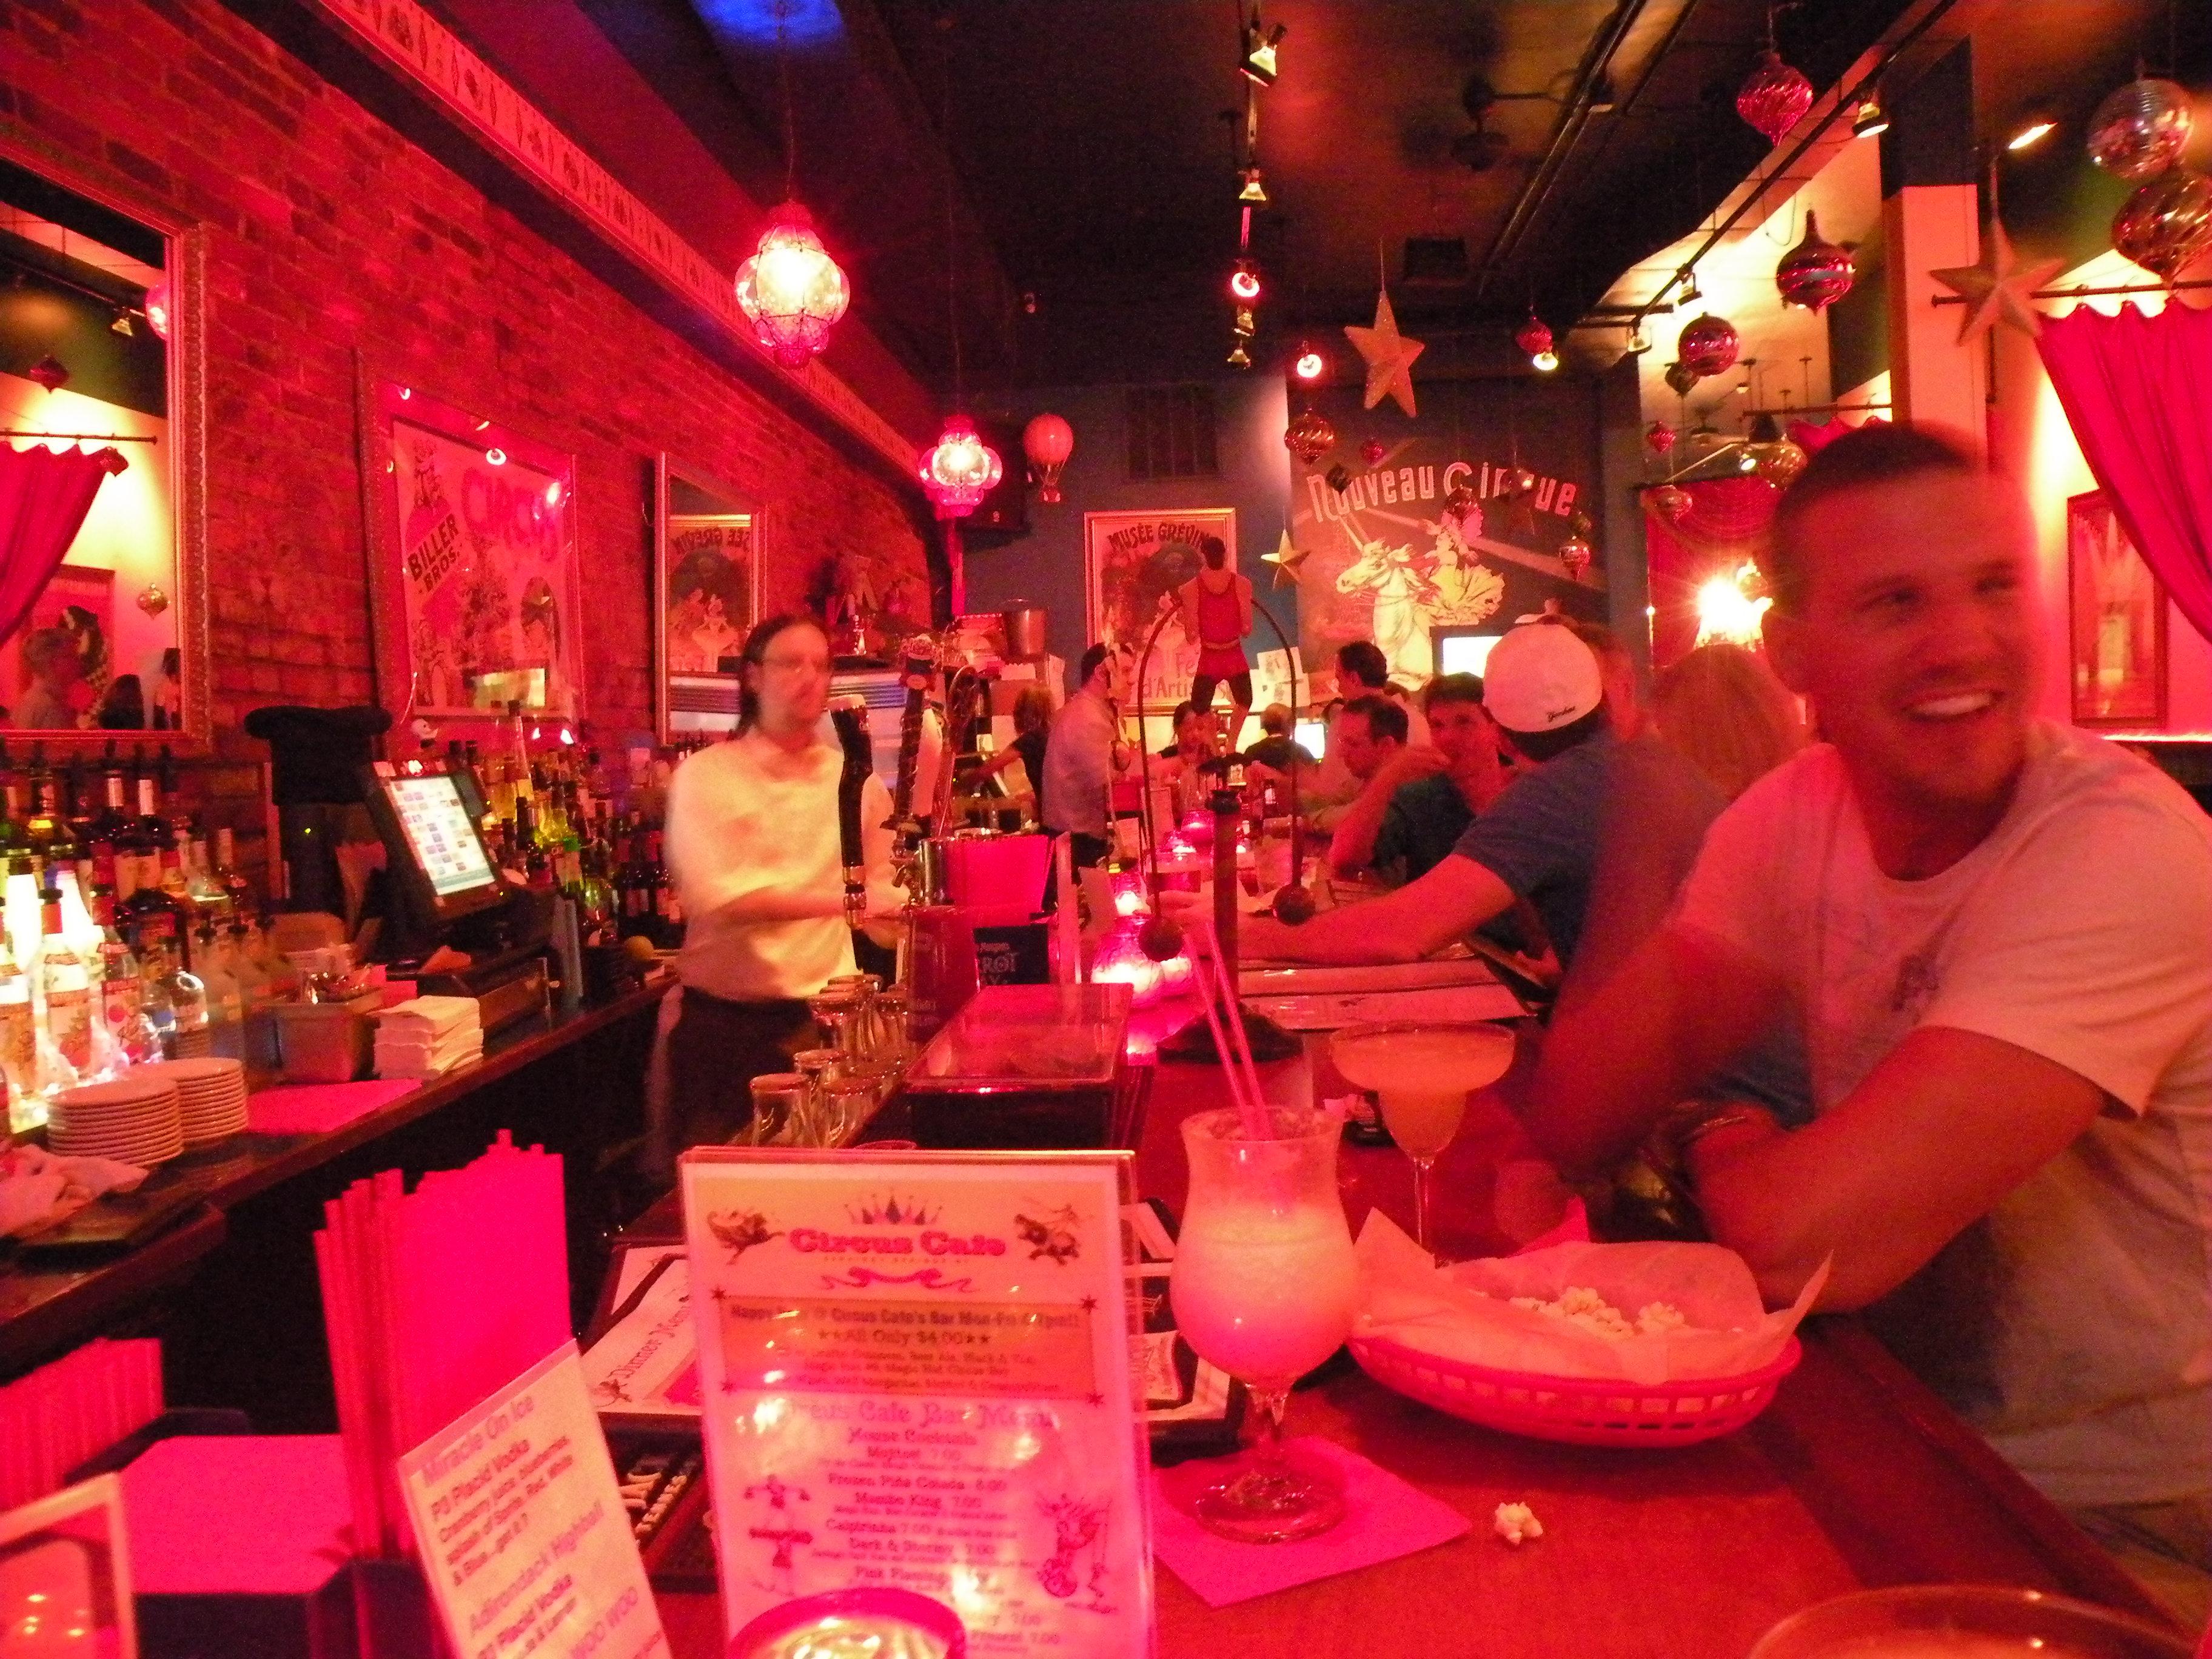 from Tatum gay bar in saratoga springs